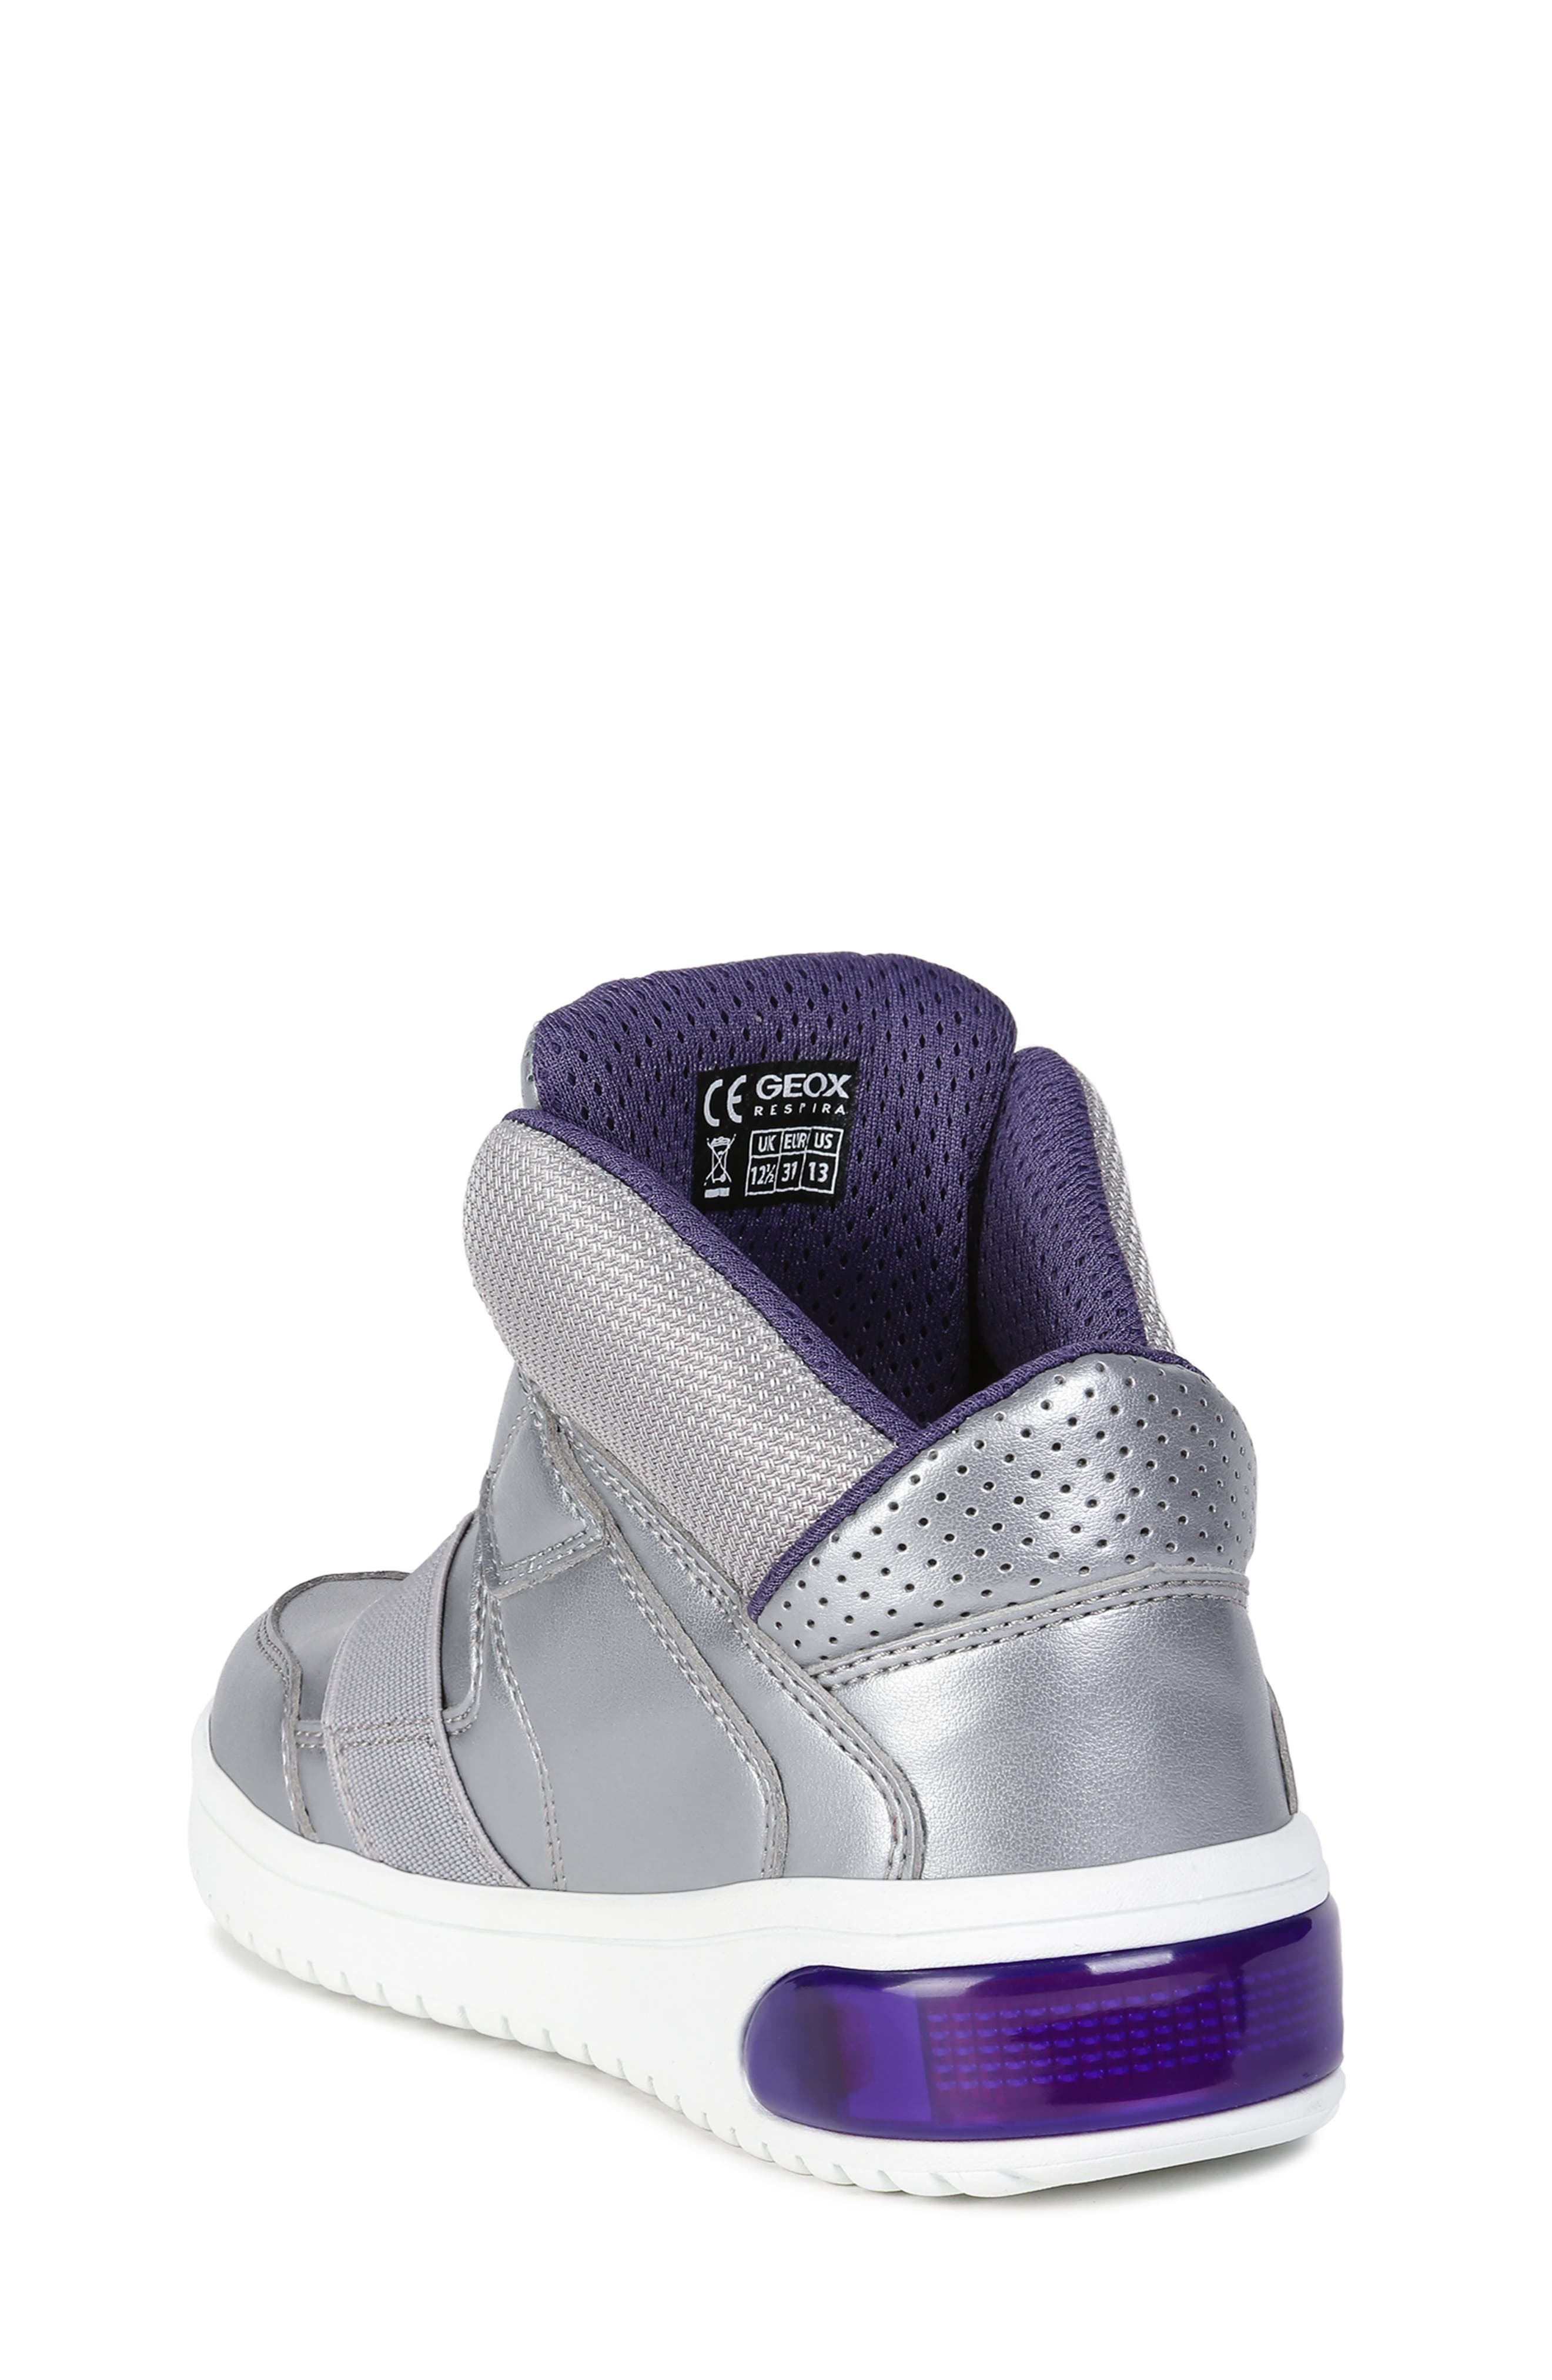 Xled Light Up Sneaker,                             Alternate thumbnail 2, color,                             SILVER/ VIOLET